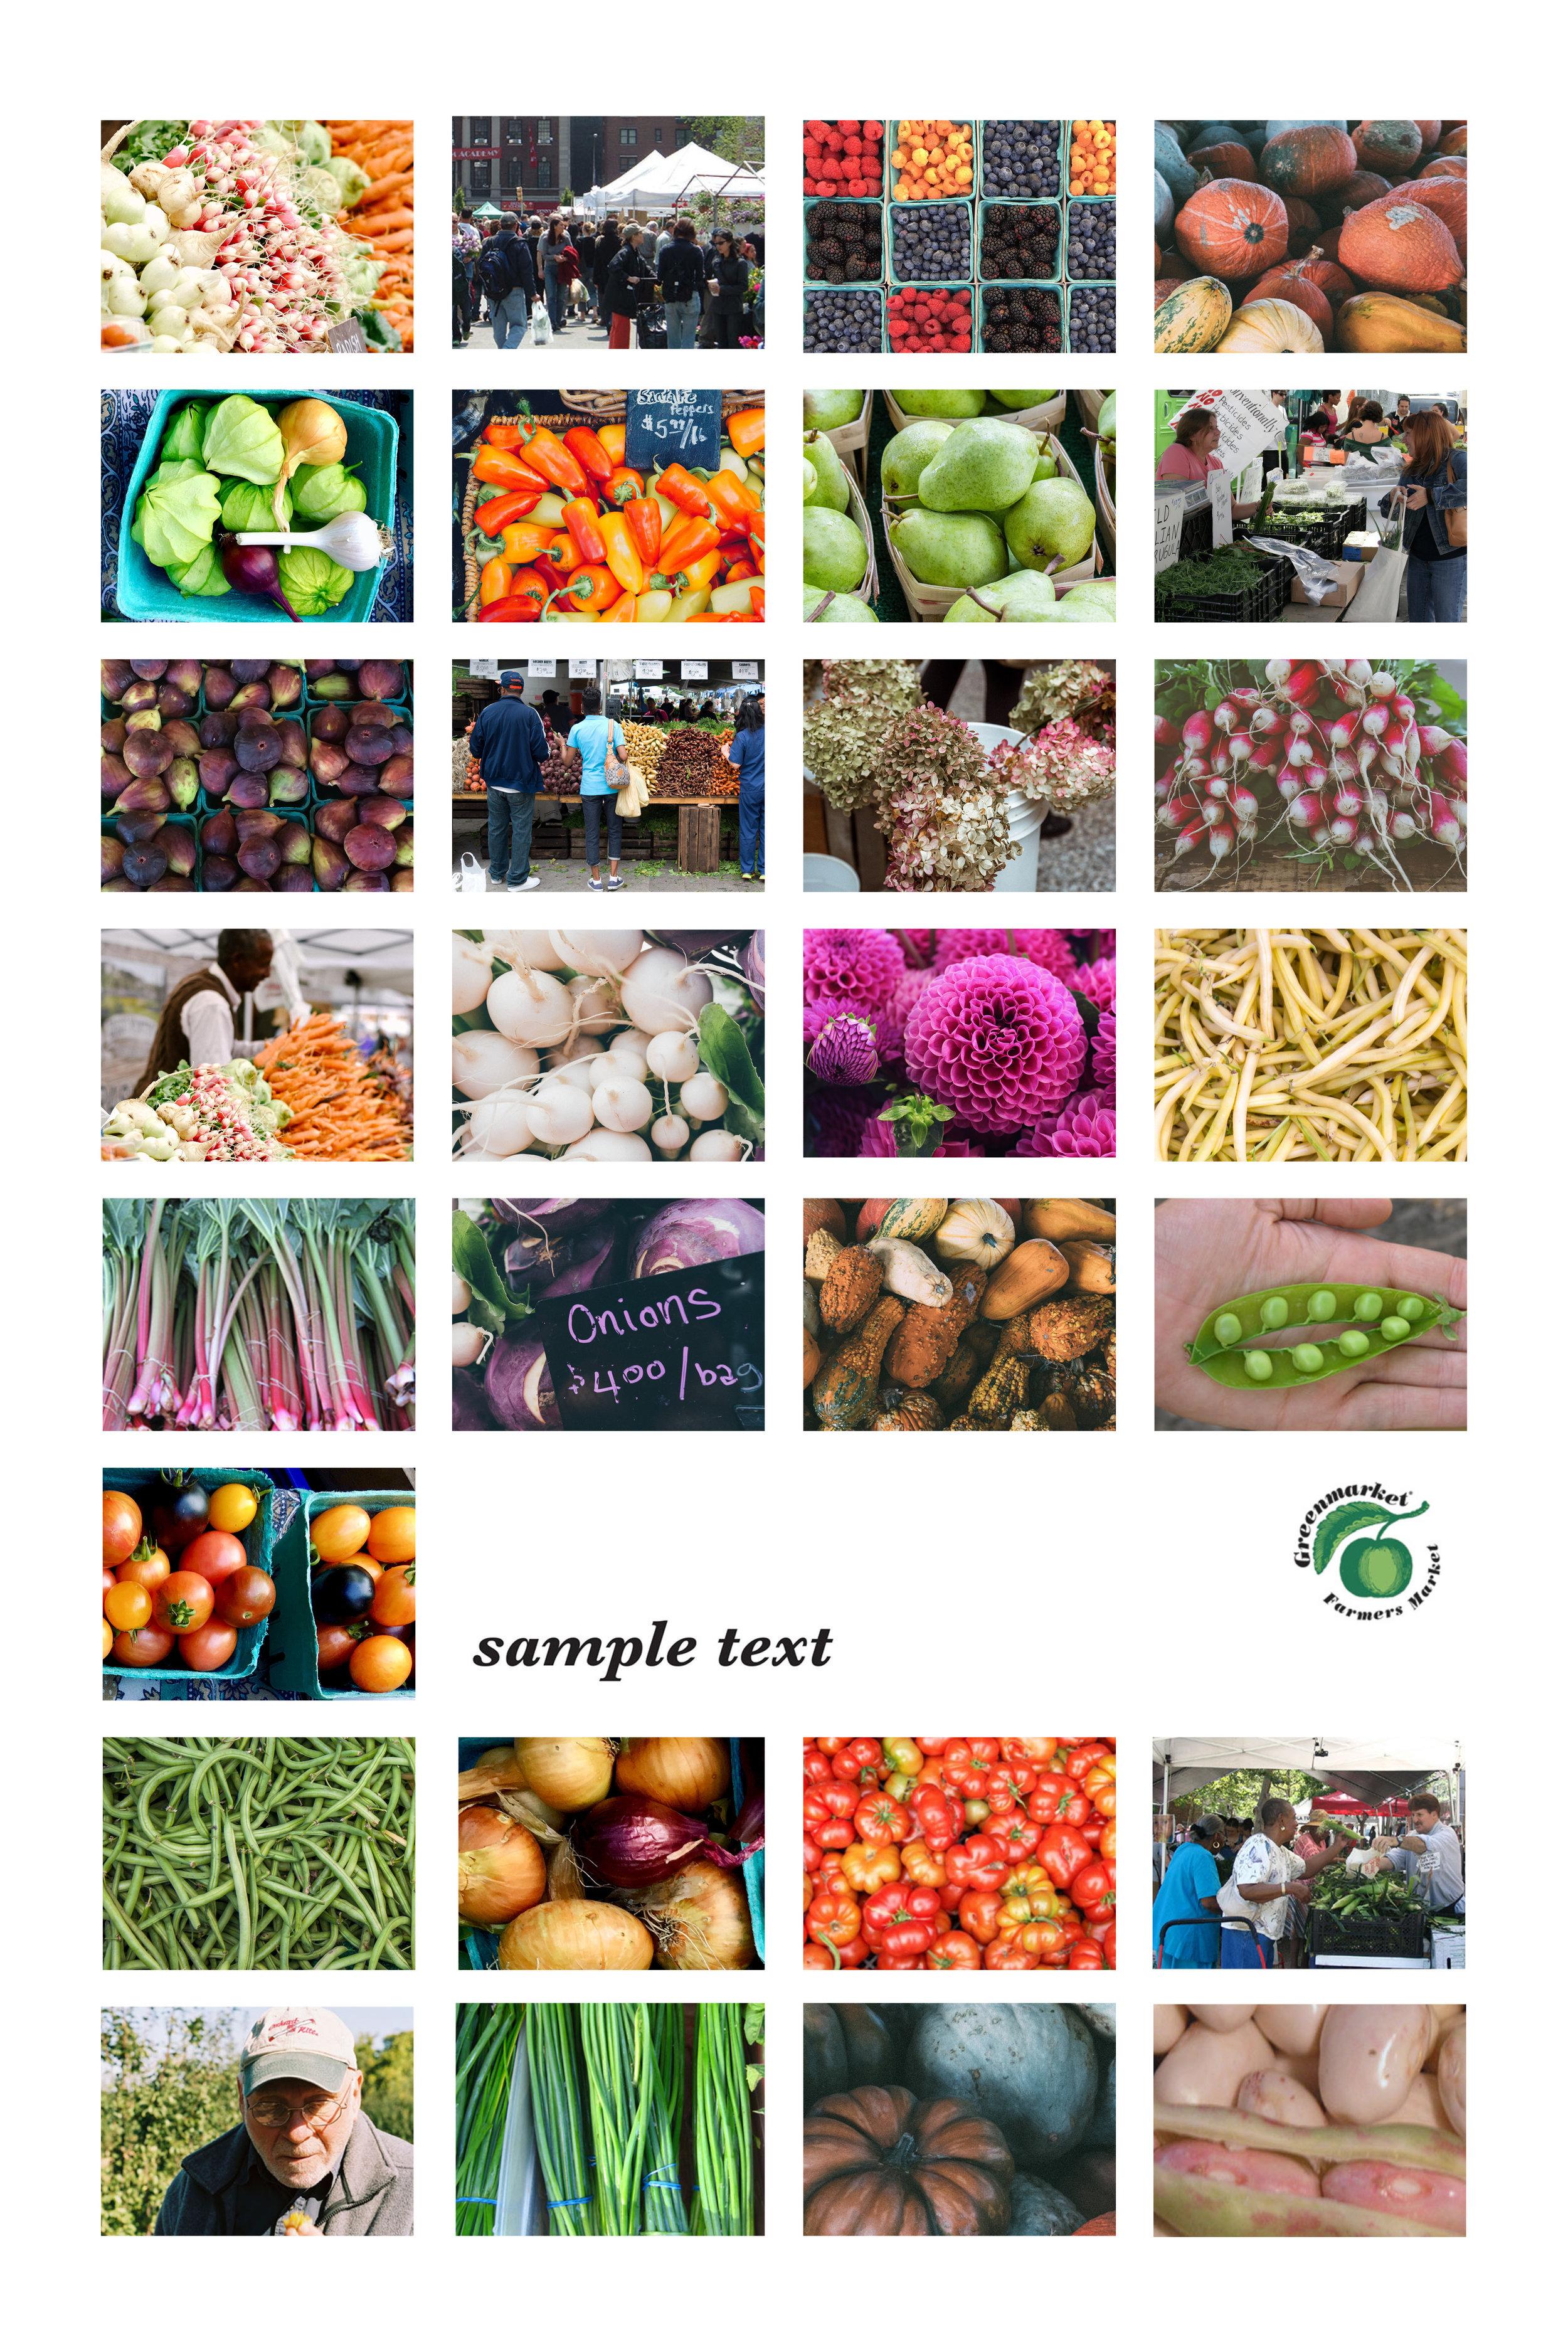 greenmarket redo2.jpg